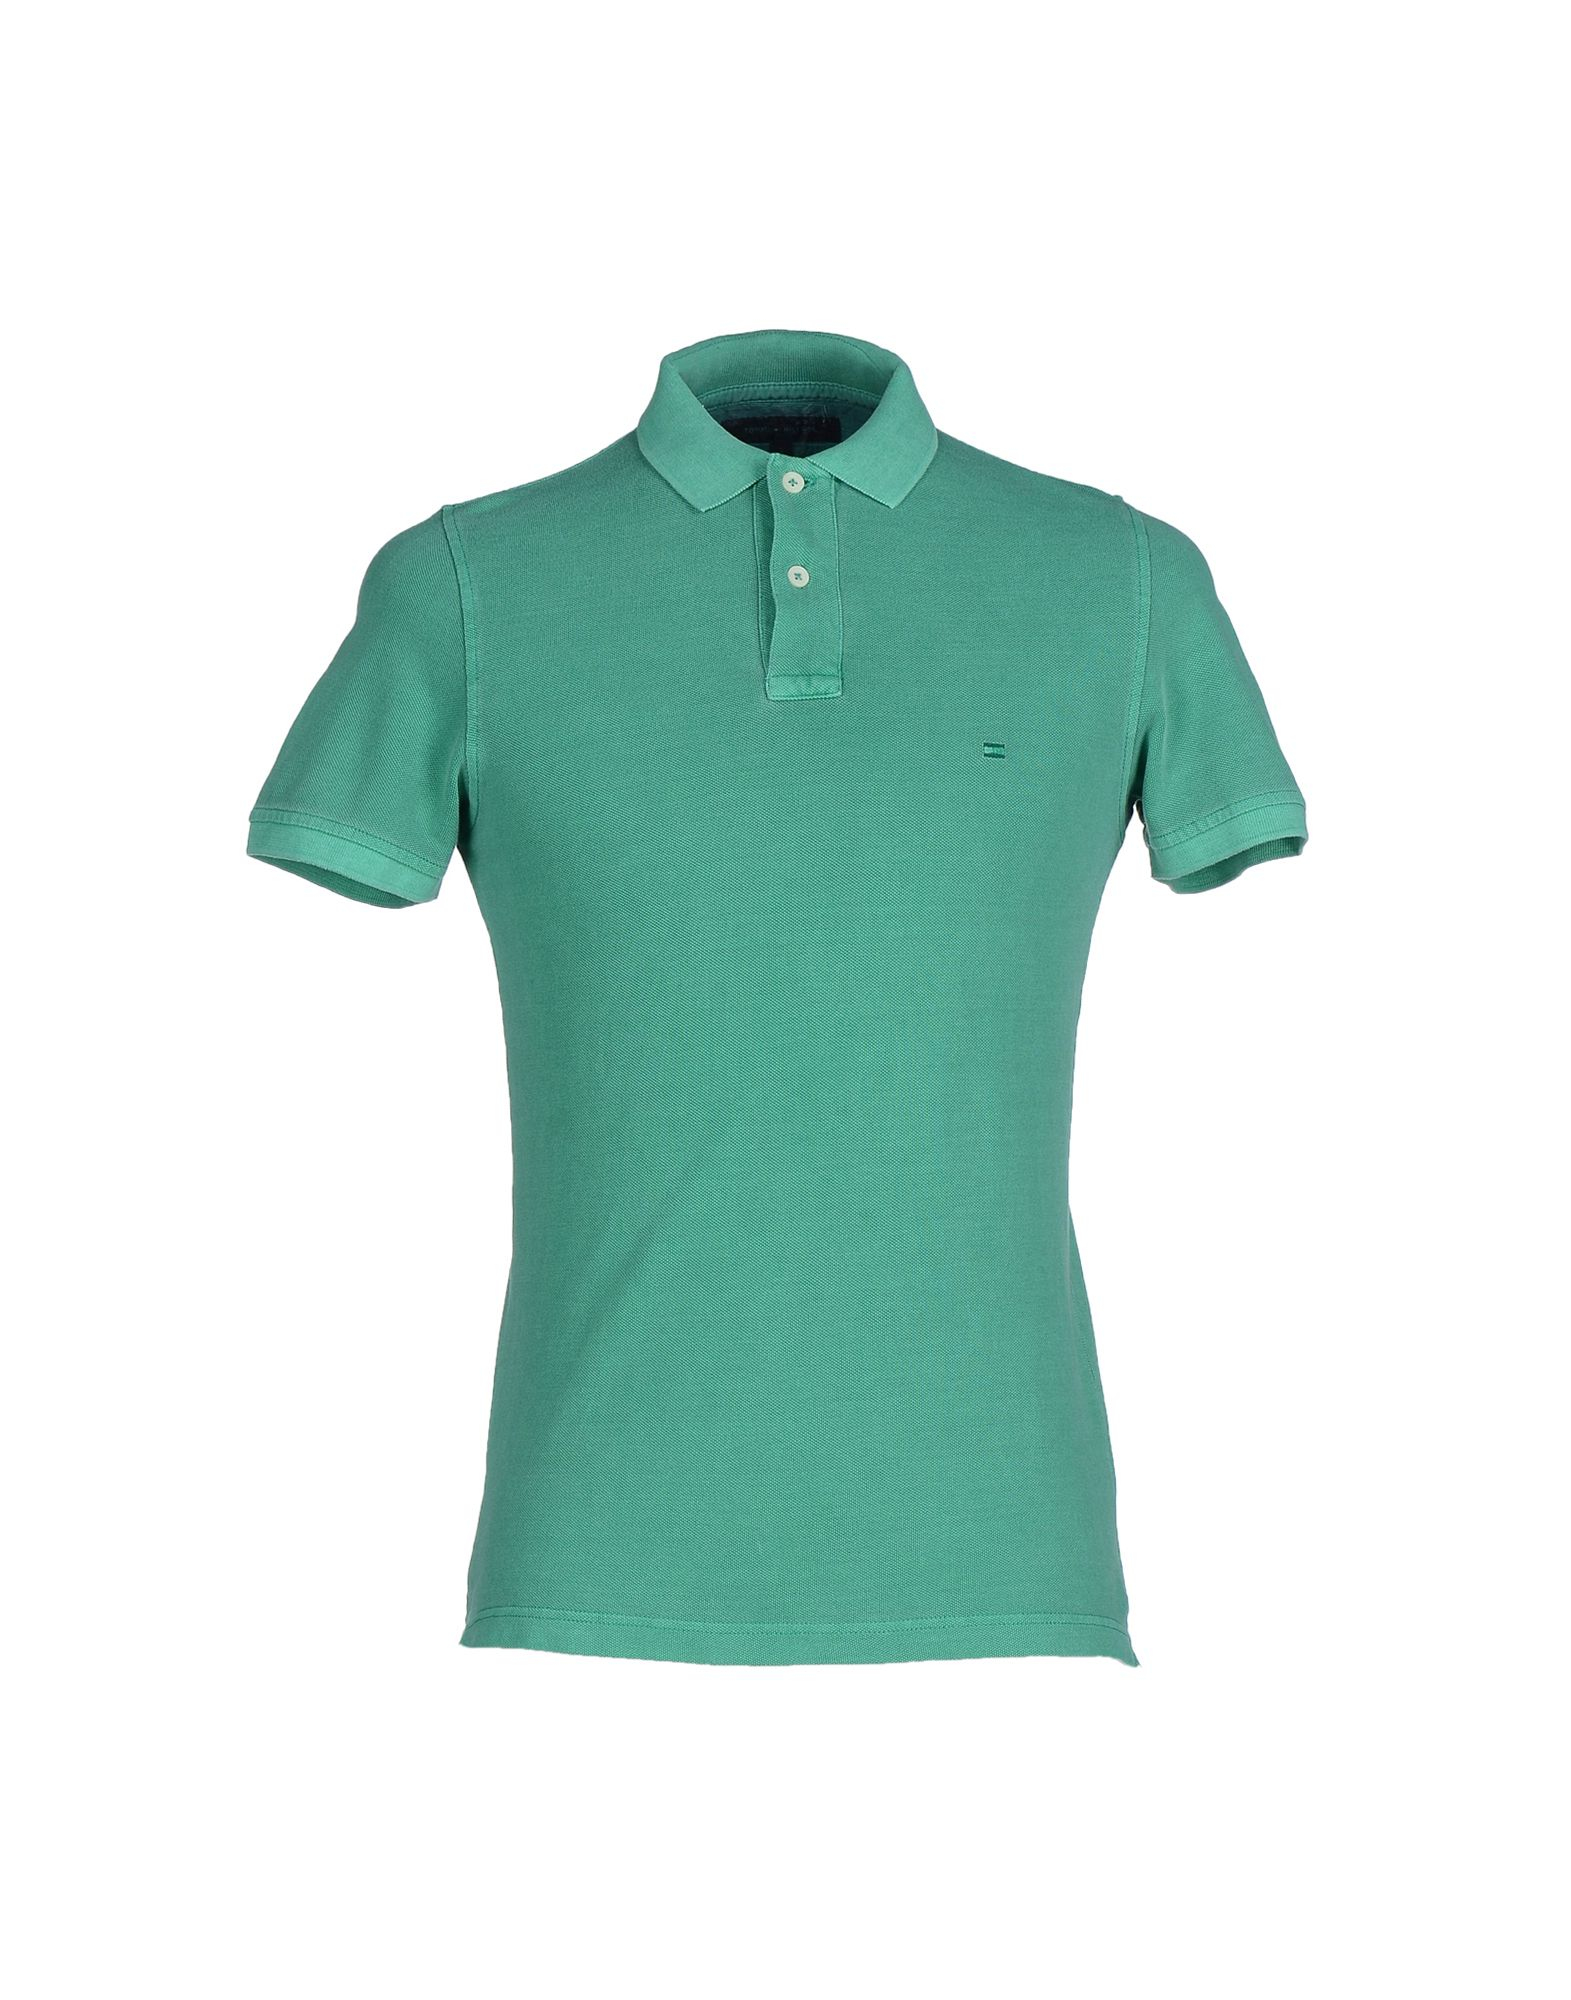 tommy hilfiger polo shirt in green for men lyst. Black Bedroom Furniture Sets. Home Design Ideas